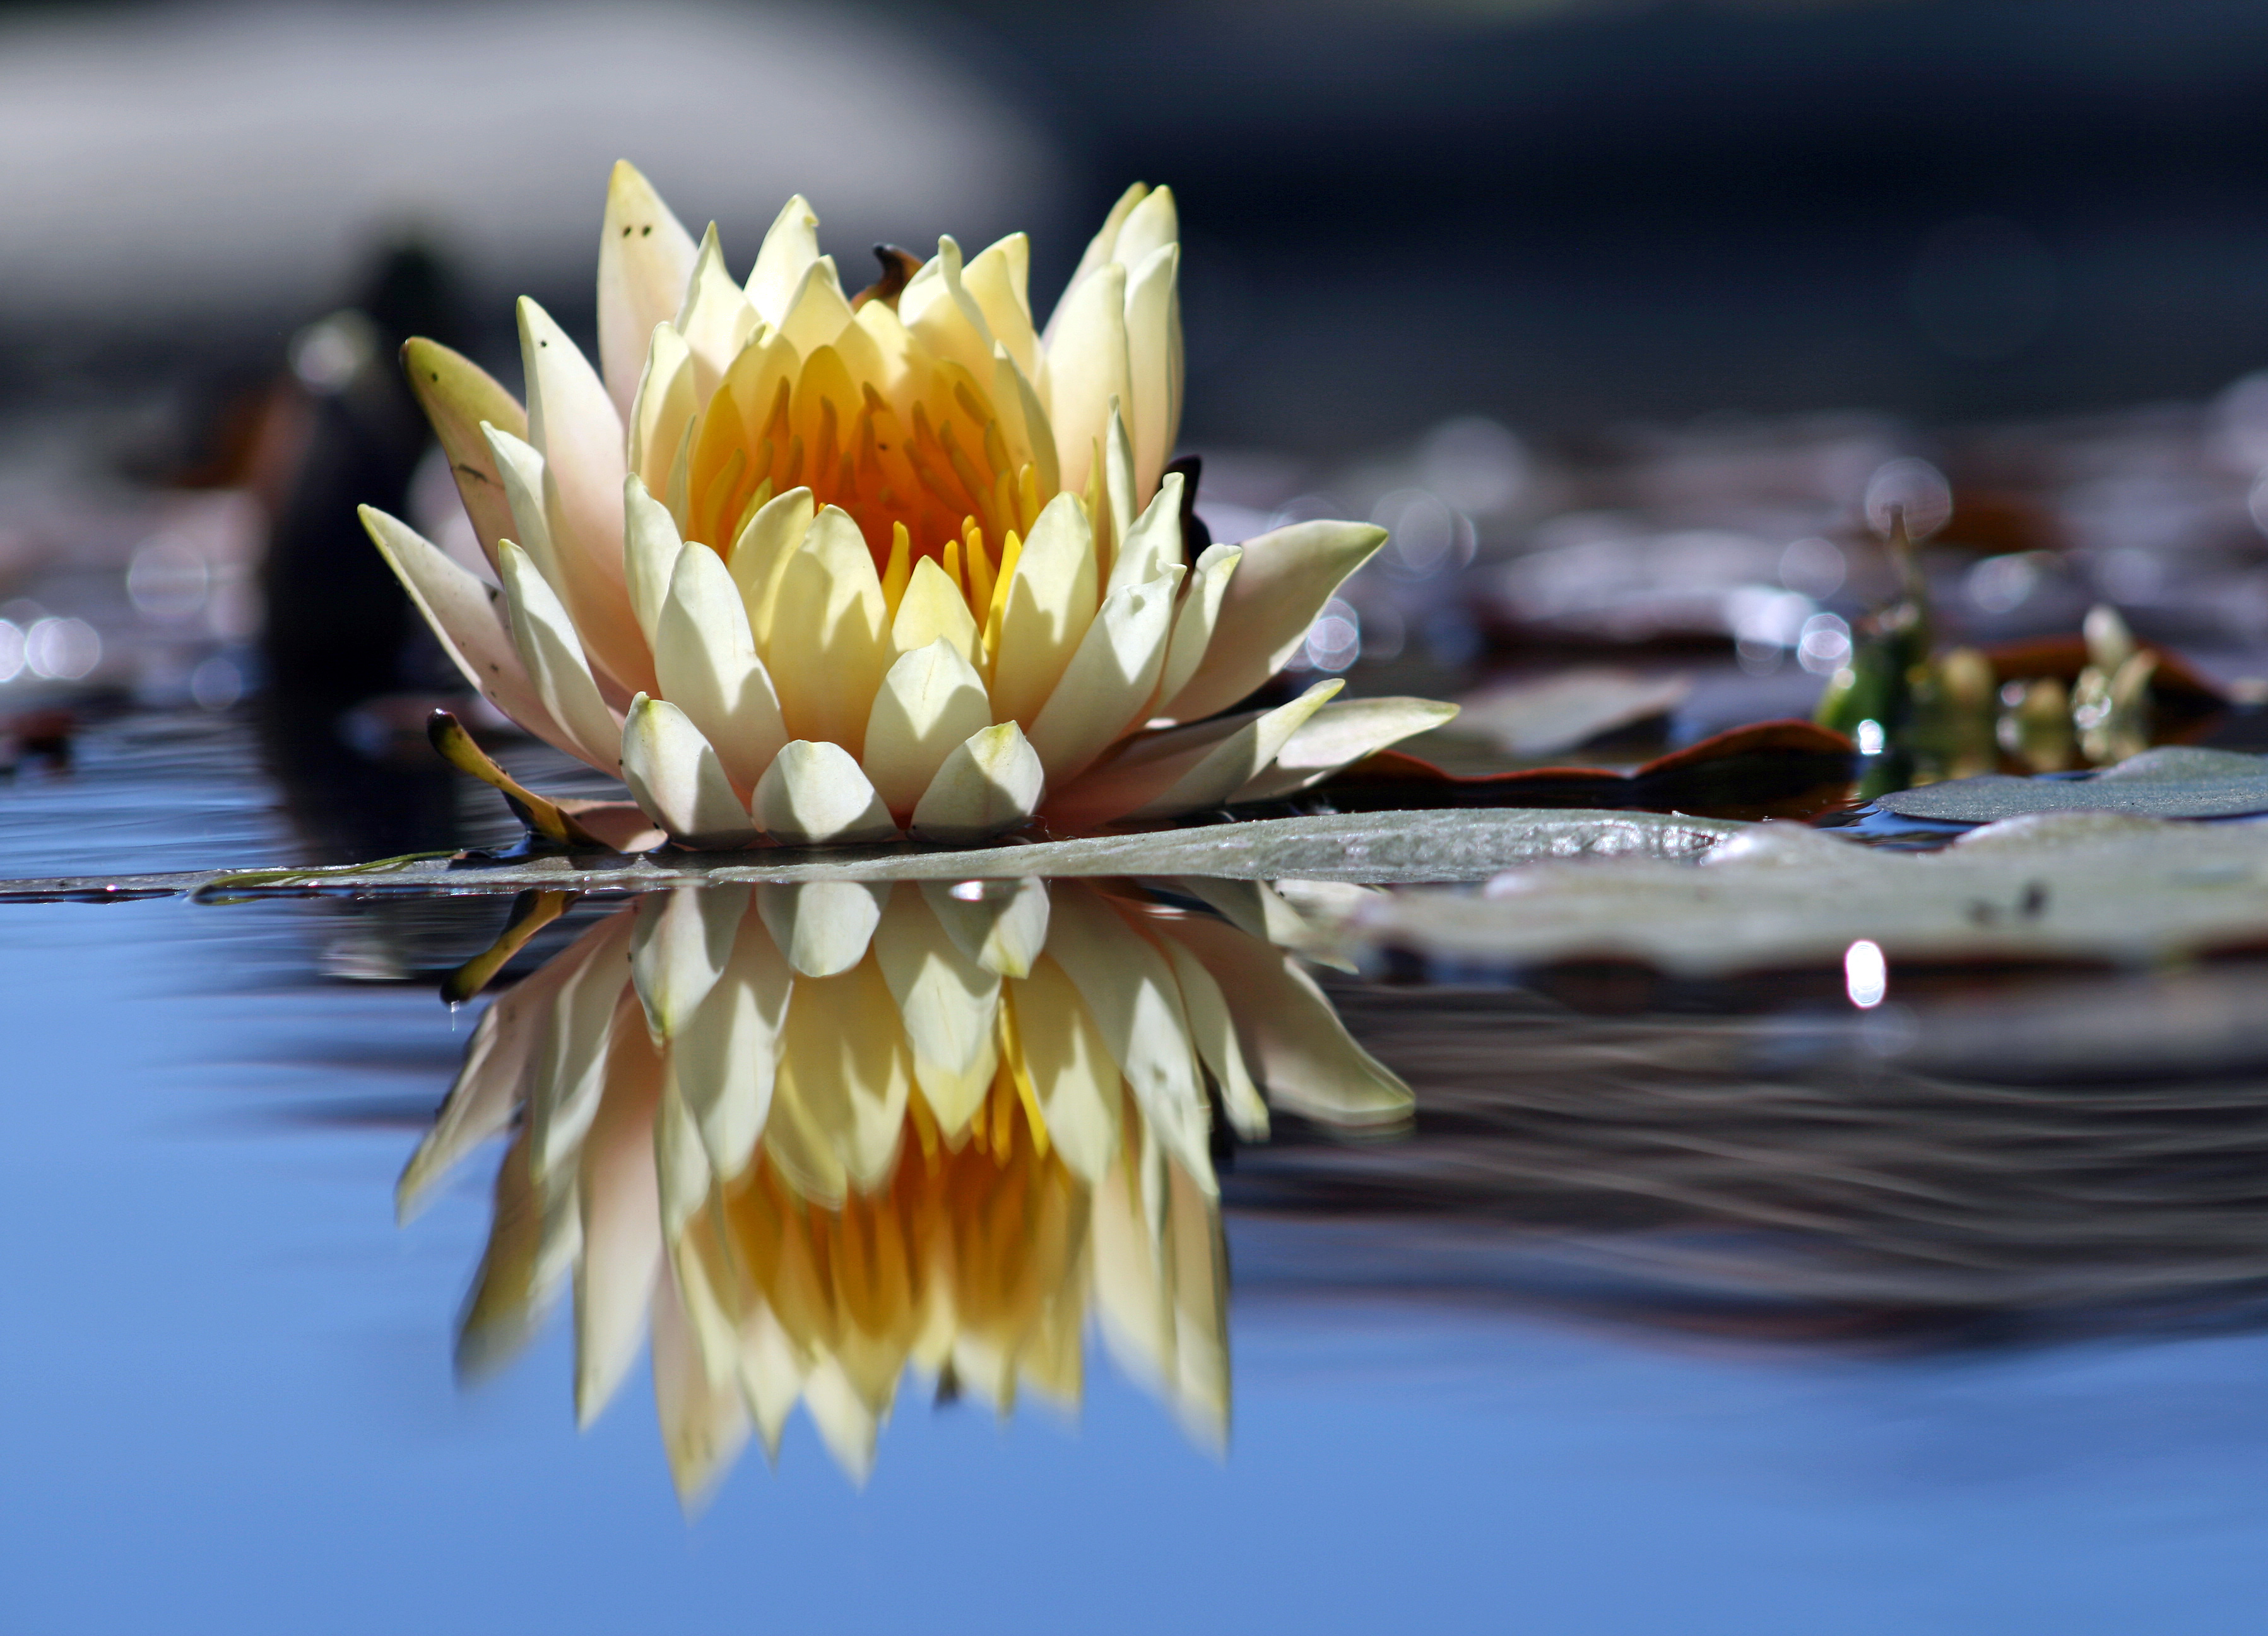 File:Flower reflection.jpg - Wikimedia Commons